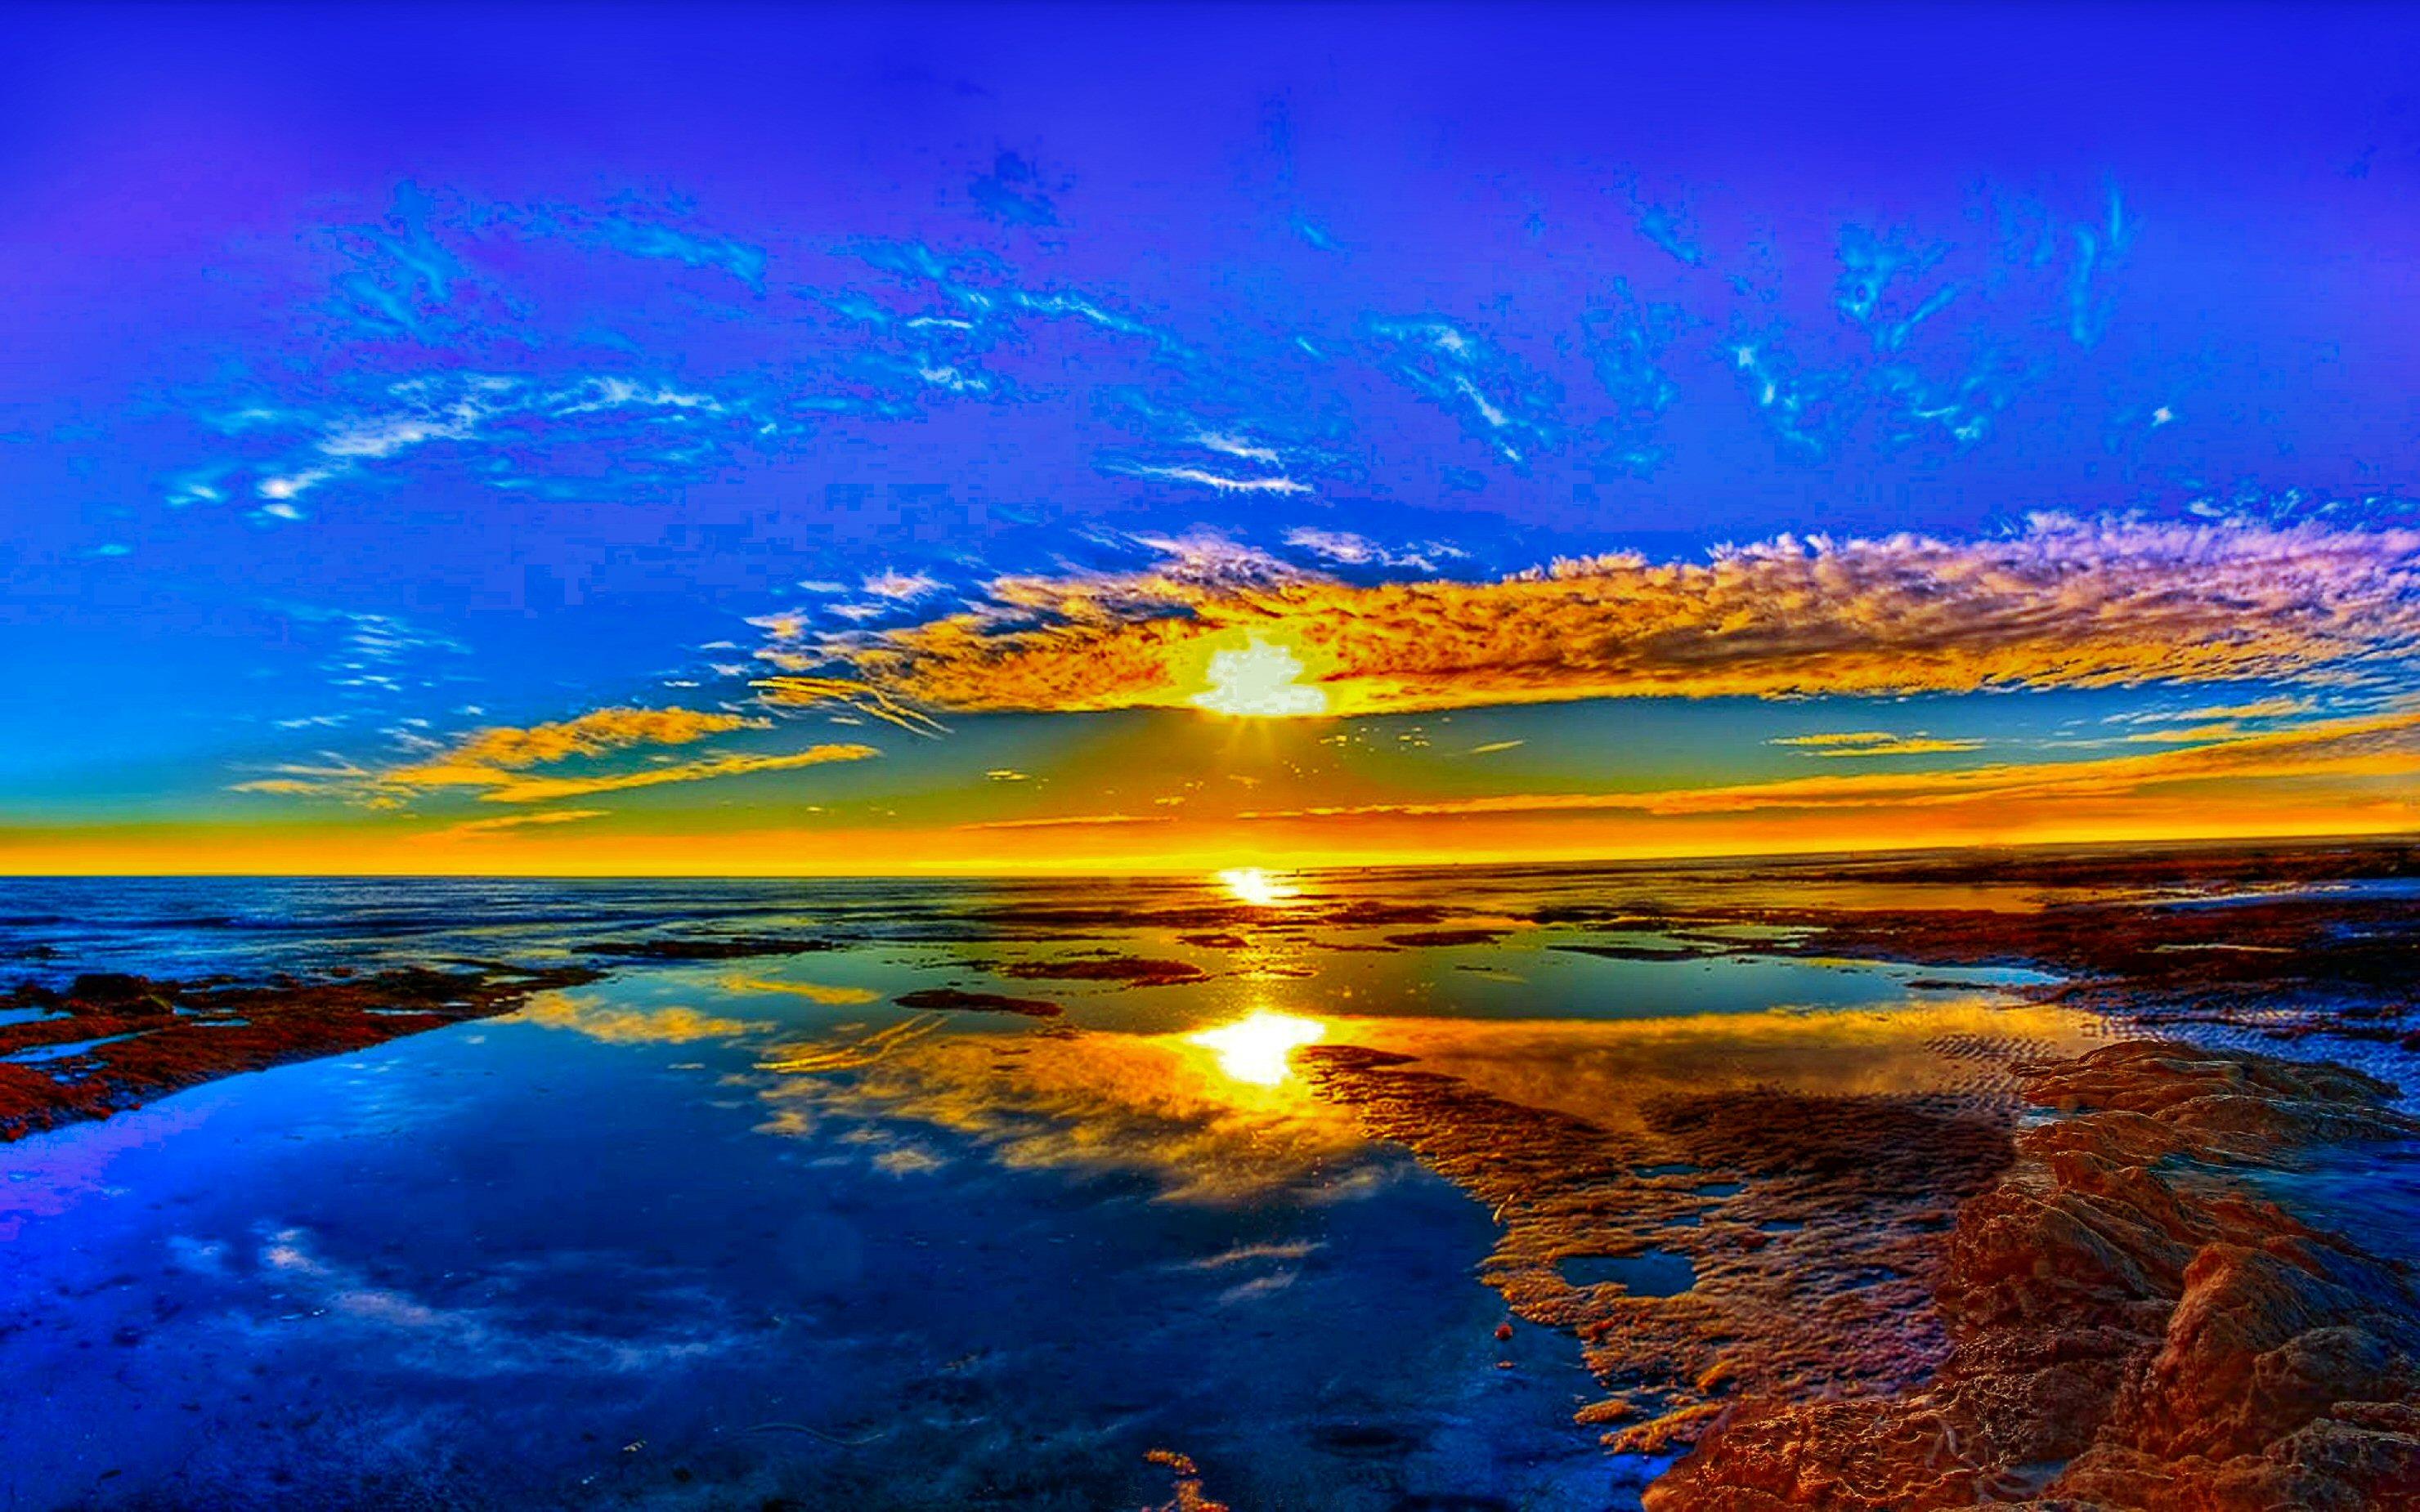 Sunset-High-Quality-Desktop-background-HD.jpg